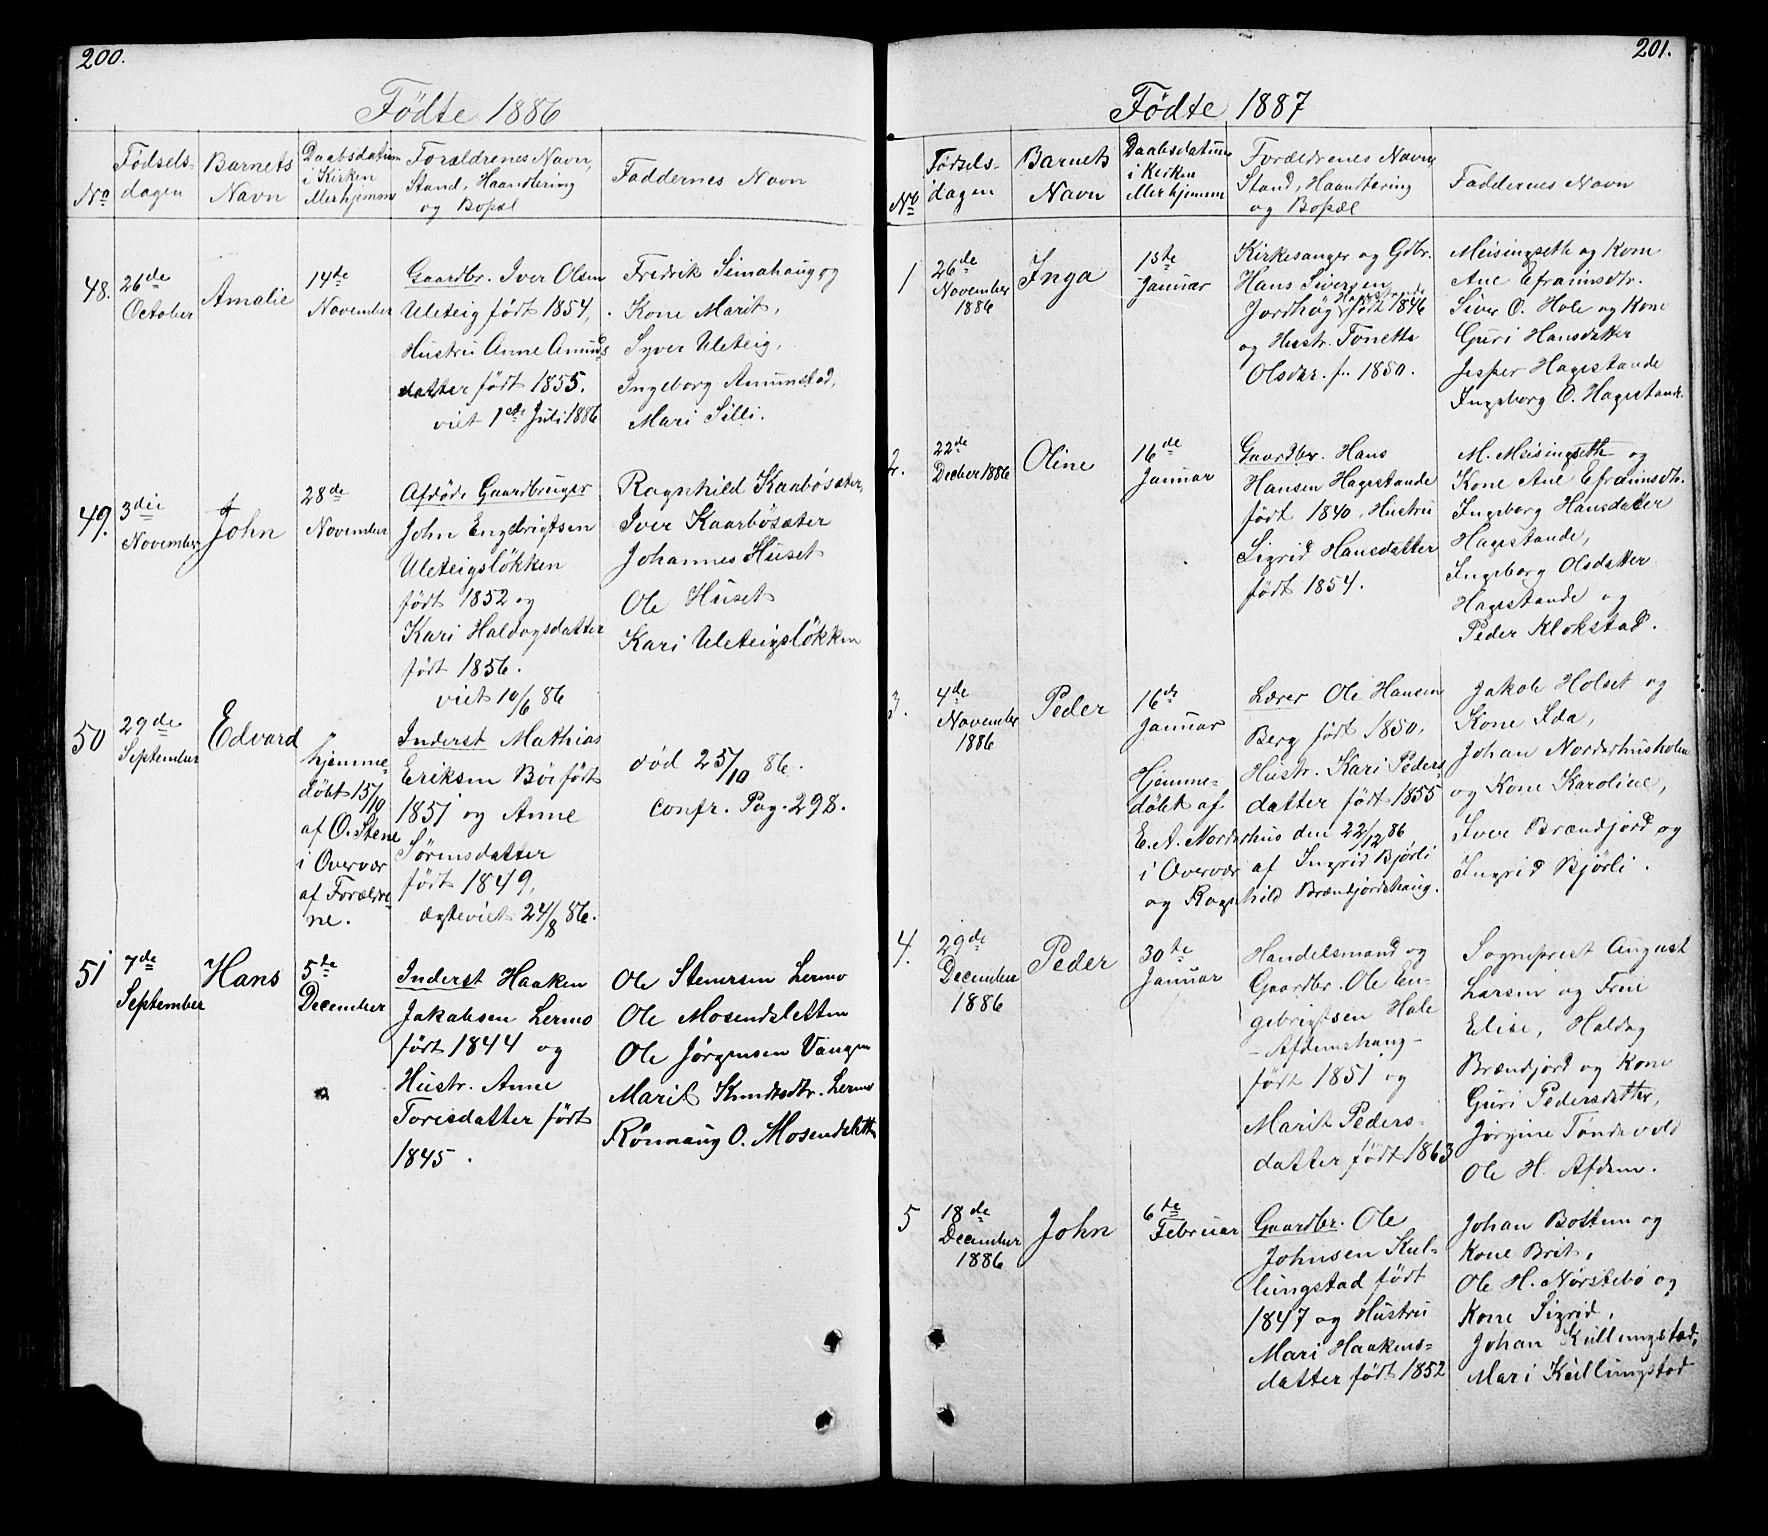 SAH, Lesja prestekontor, Klokkerbok nr. 5, 1850-1894, s. 200-201